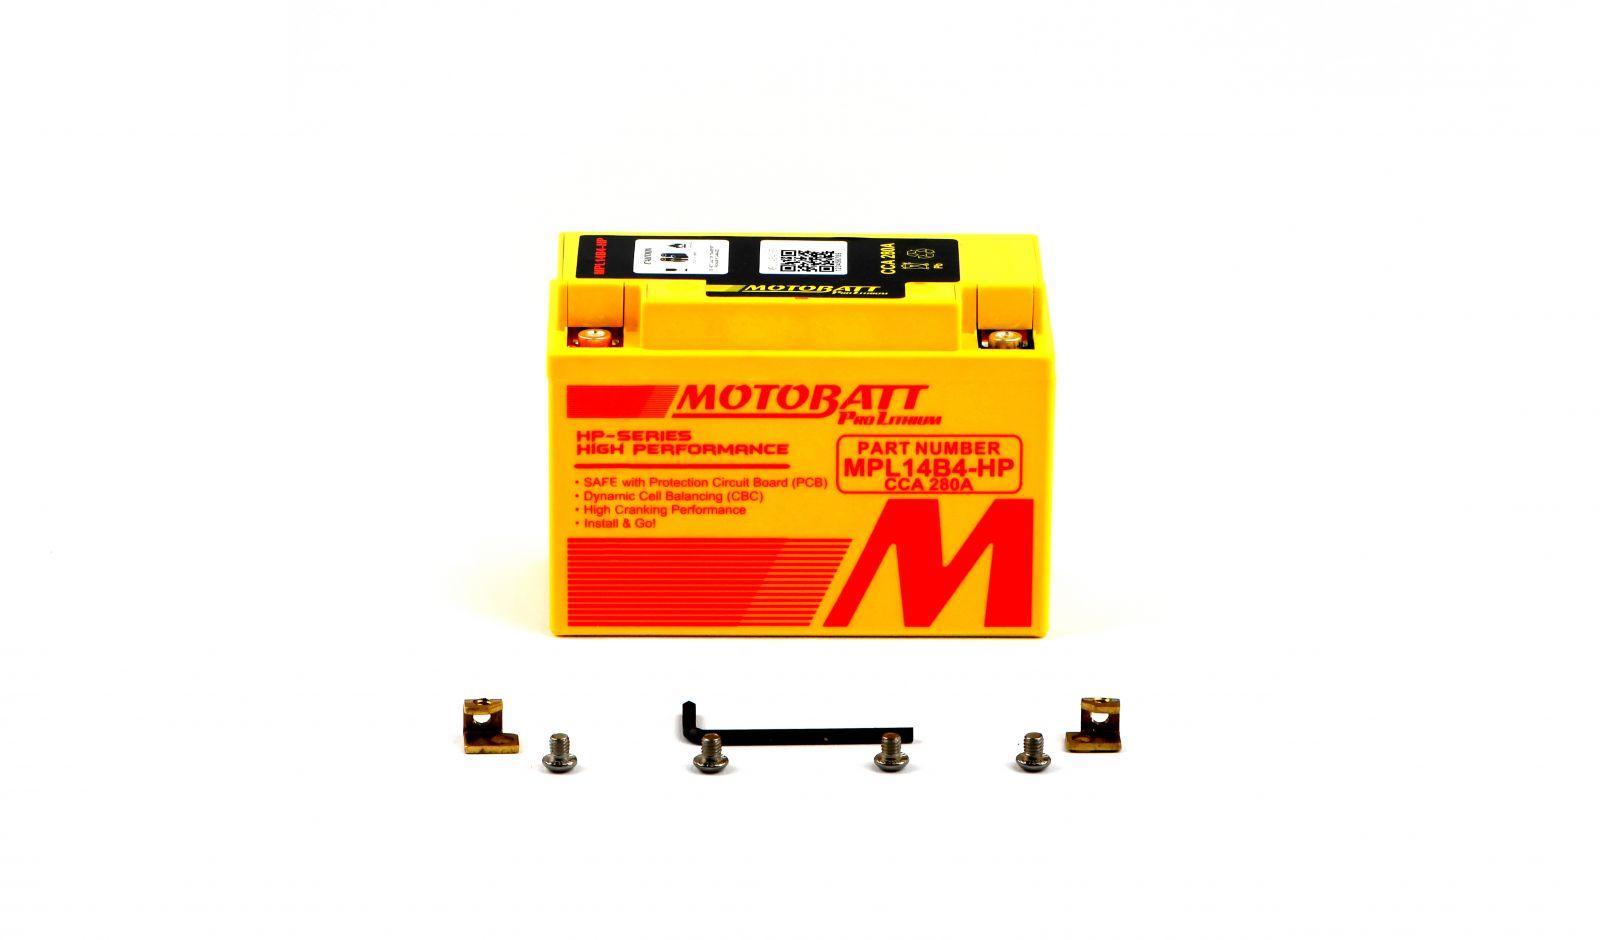 Motobatt Lithium Batteries - 501146MR image